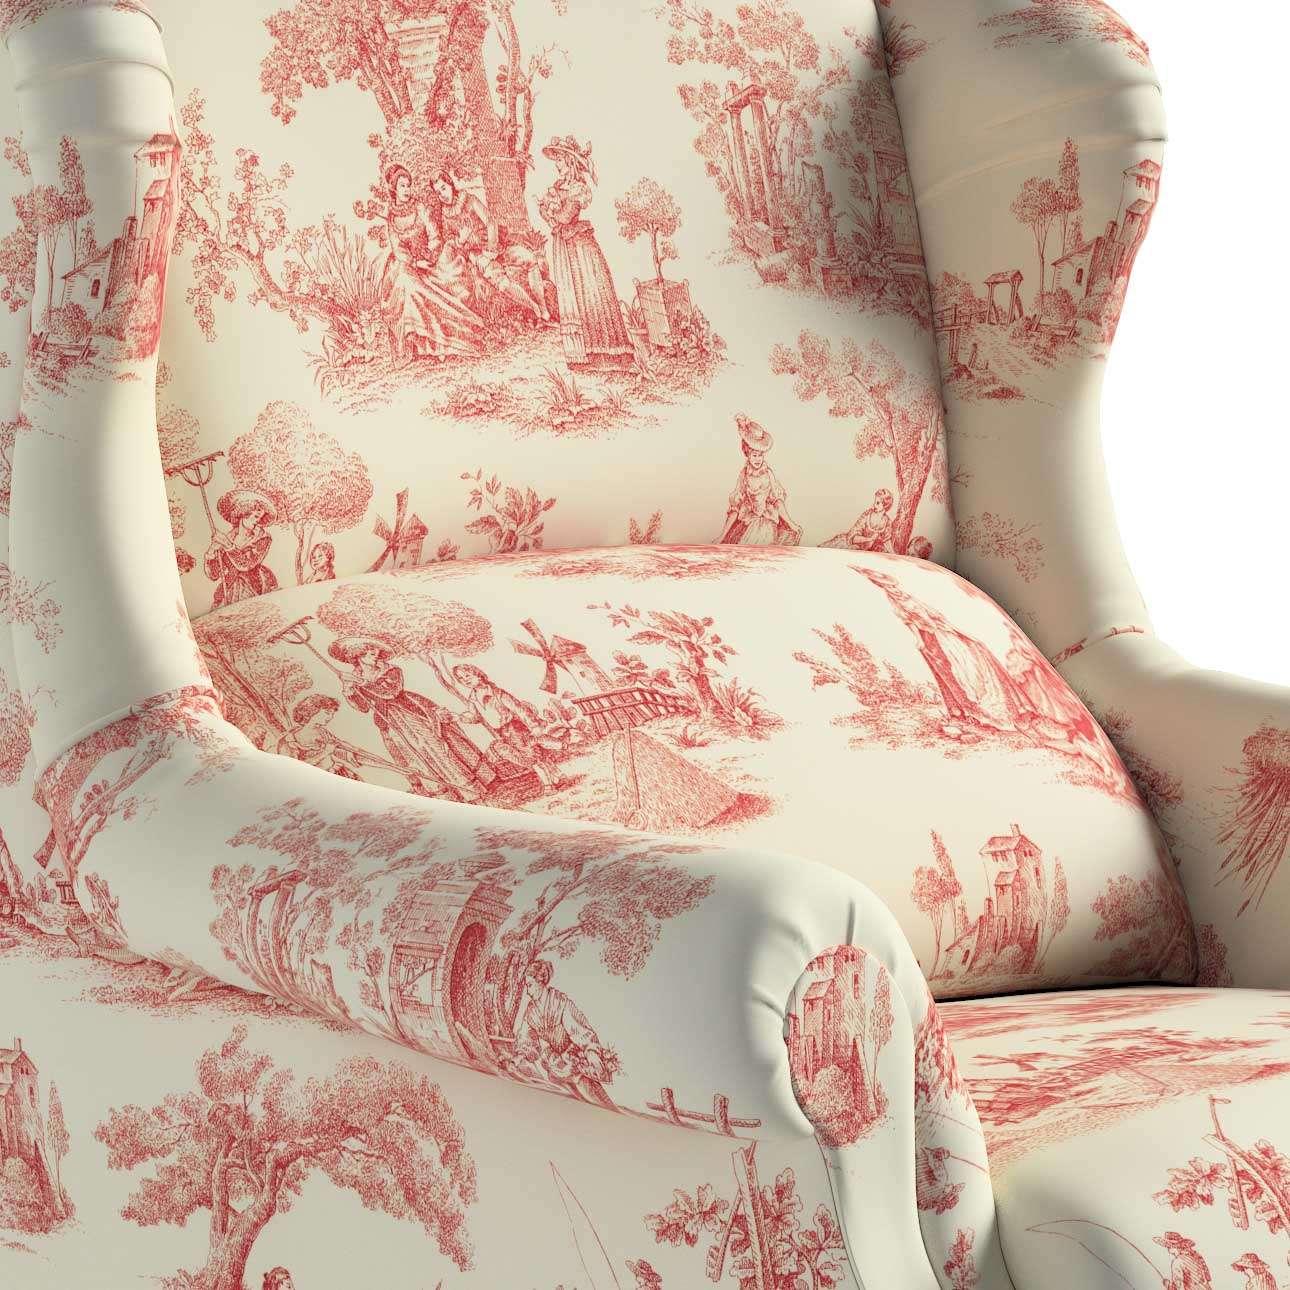 Stilingas Dekoria fotelis 63 x 115 cm kolekcijoje Avinon, audinys: 132-15